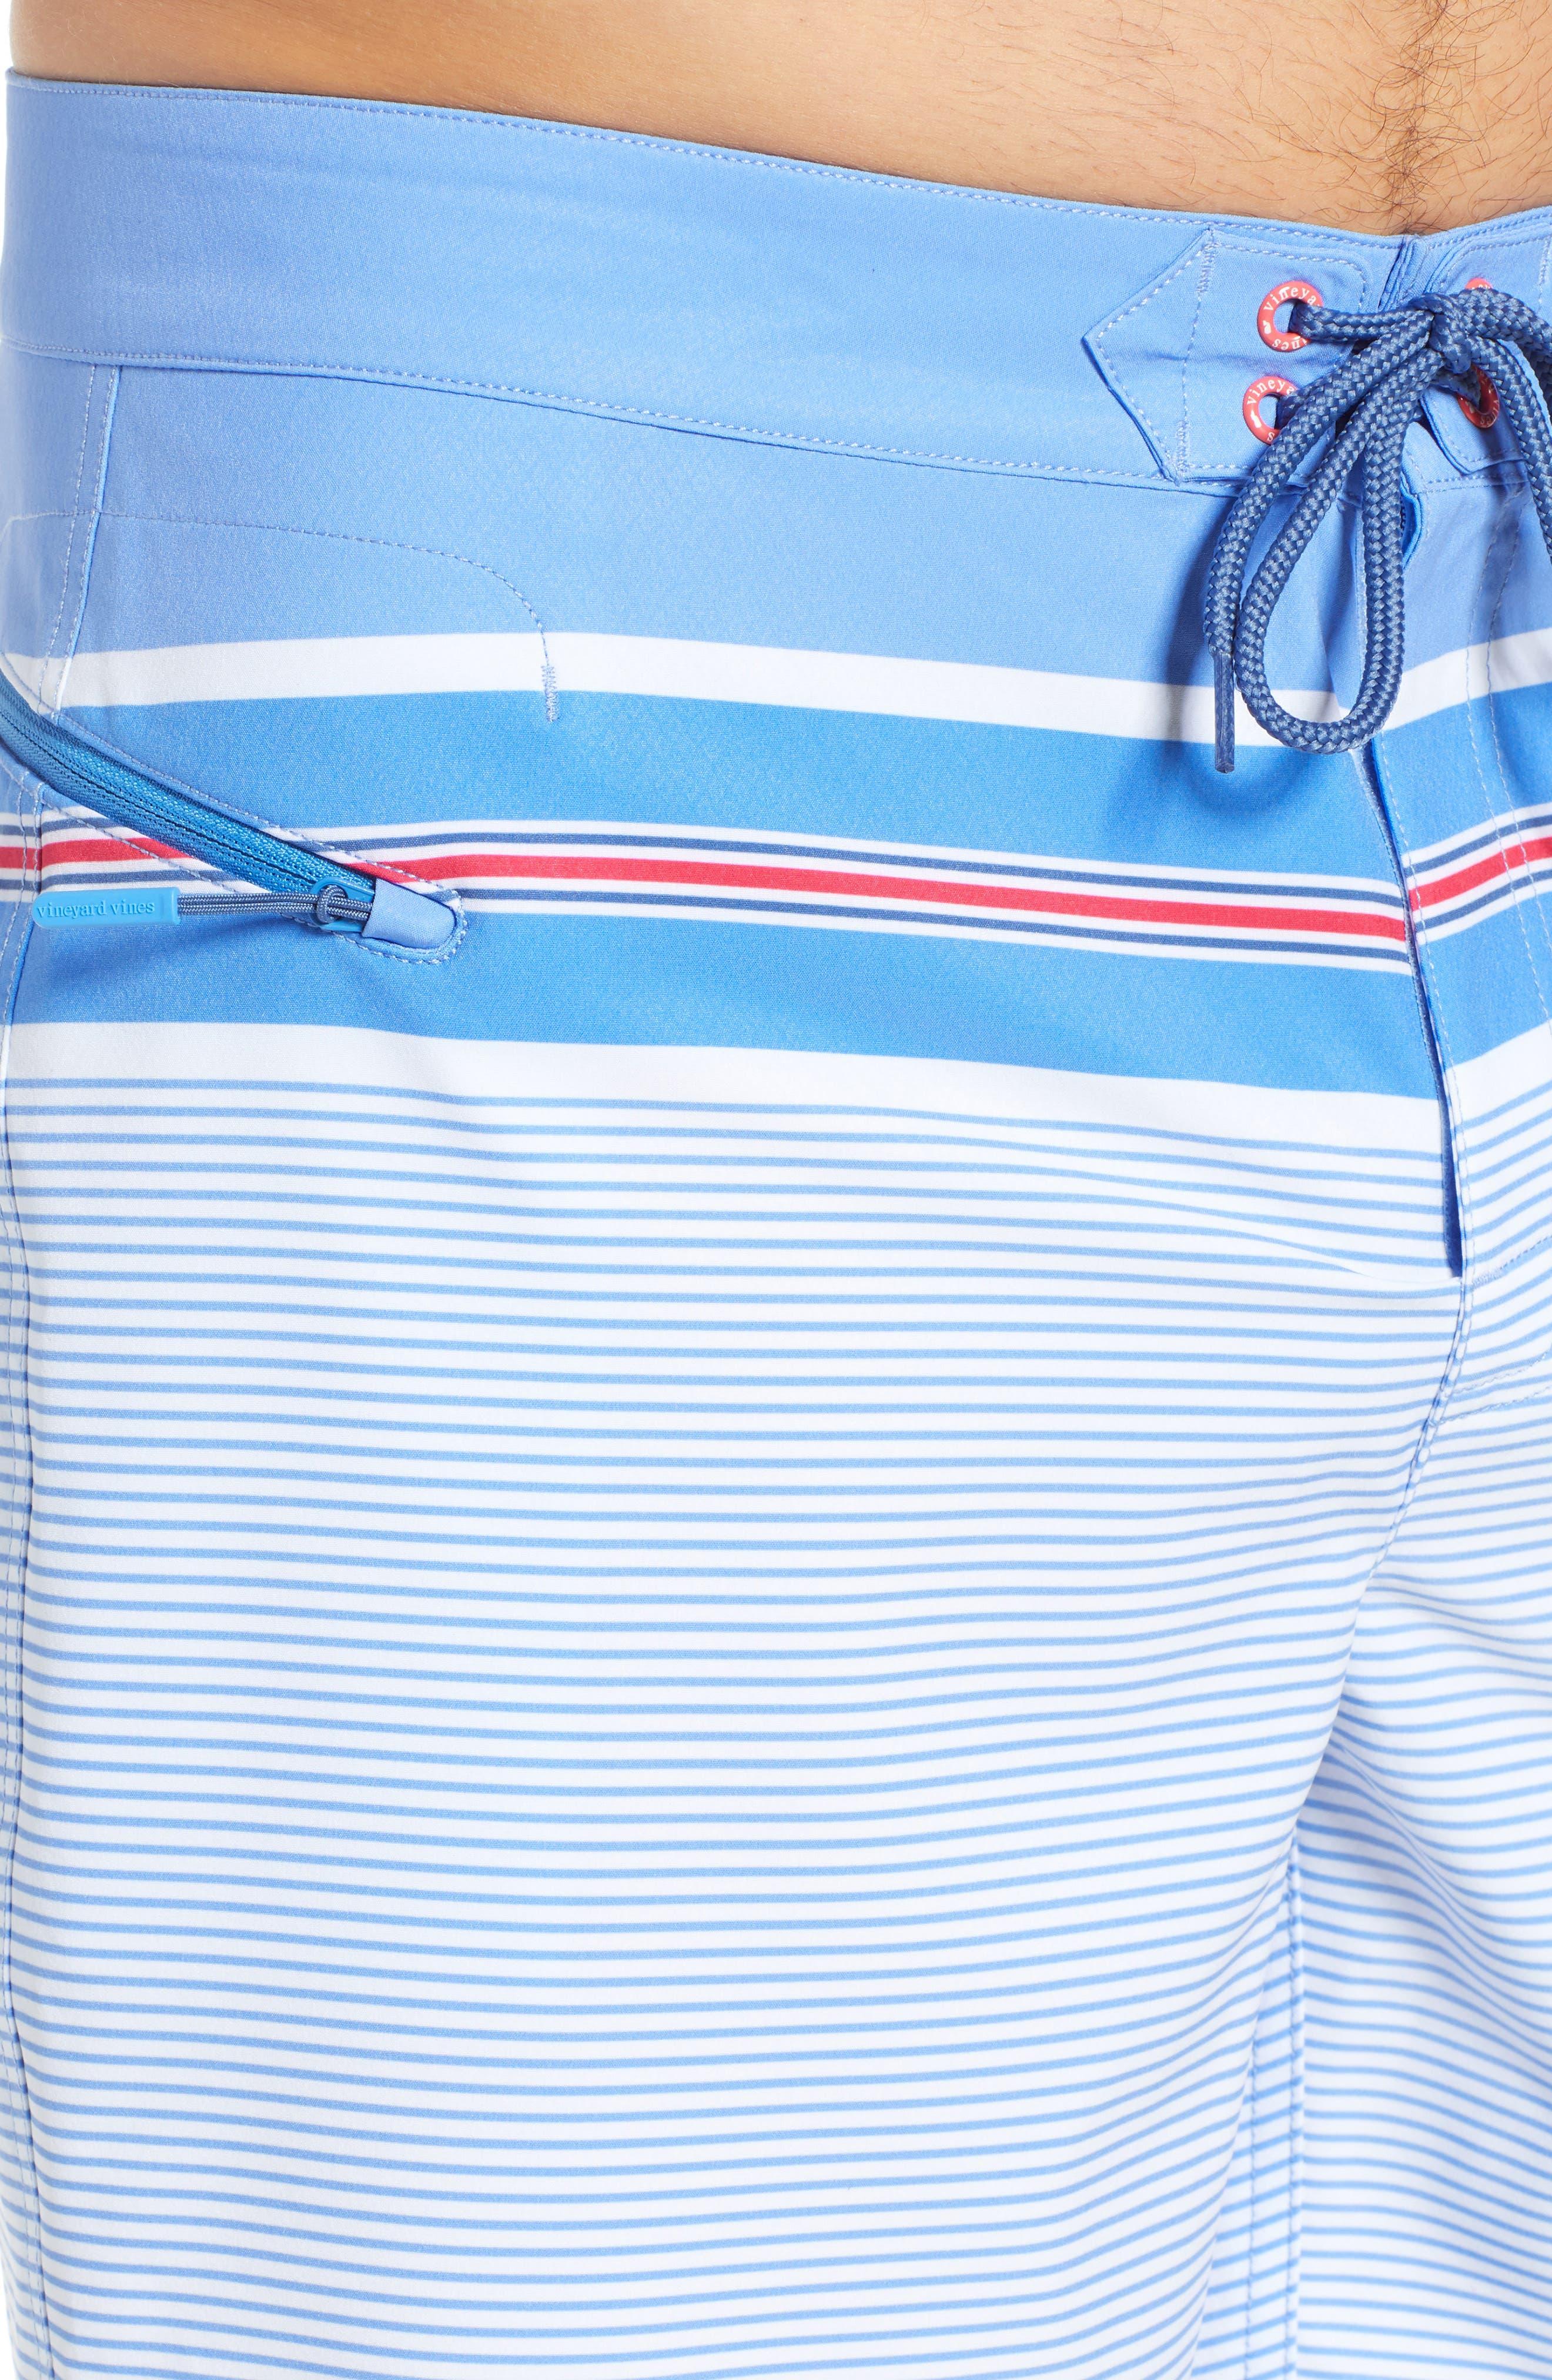 VINEYARD VINES,                             Birchcliff Stripe Board Shorts,                             Alternate thumbnail 4, color,                             484